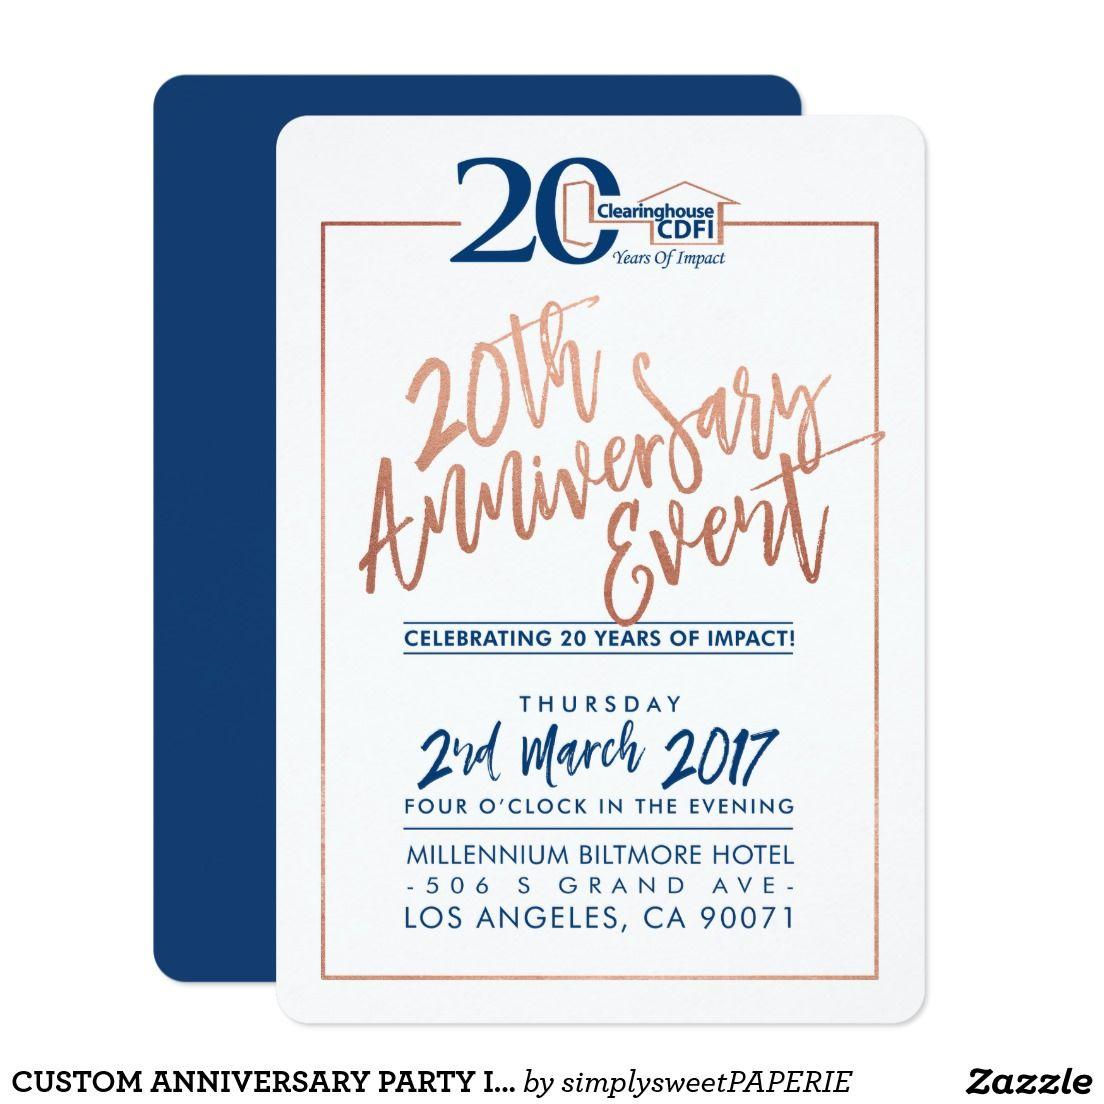 Custom Anniversary Party Invite Corporate Navy 2 Zazzle Com